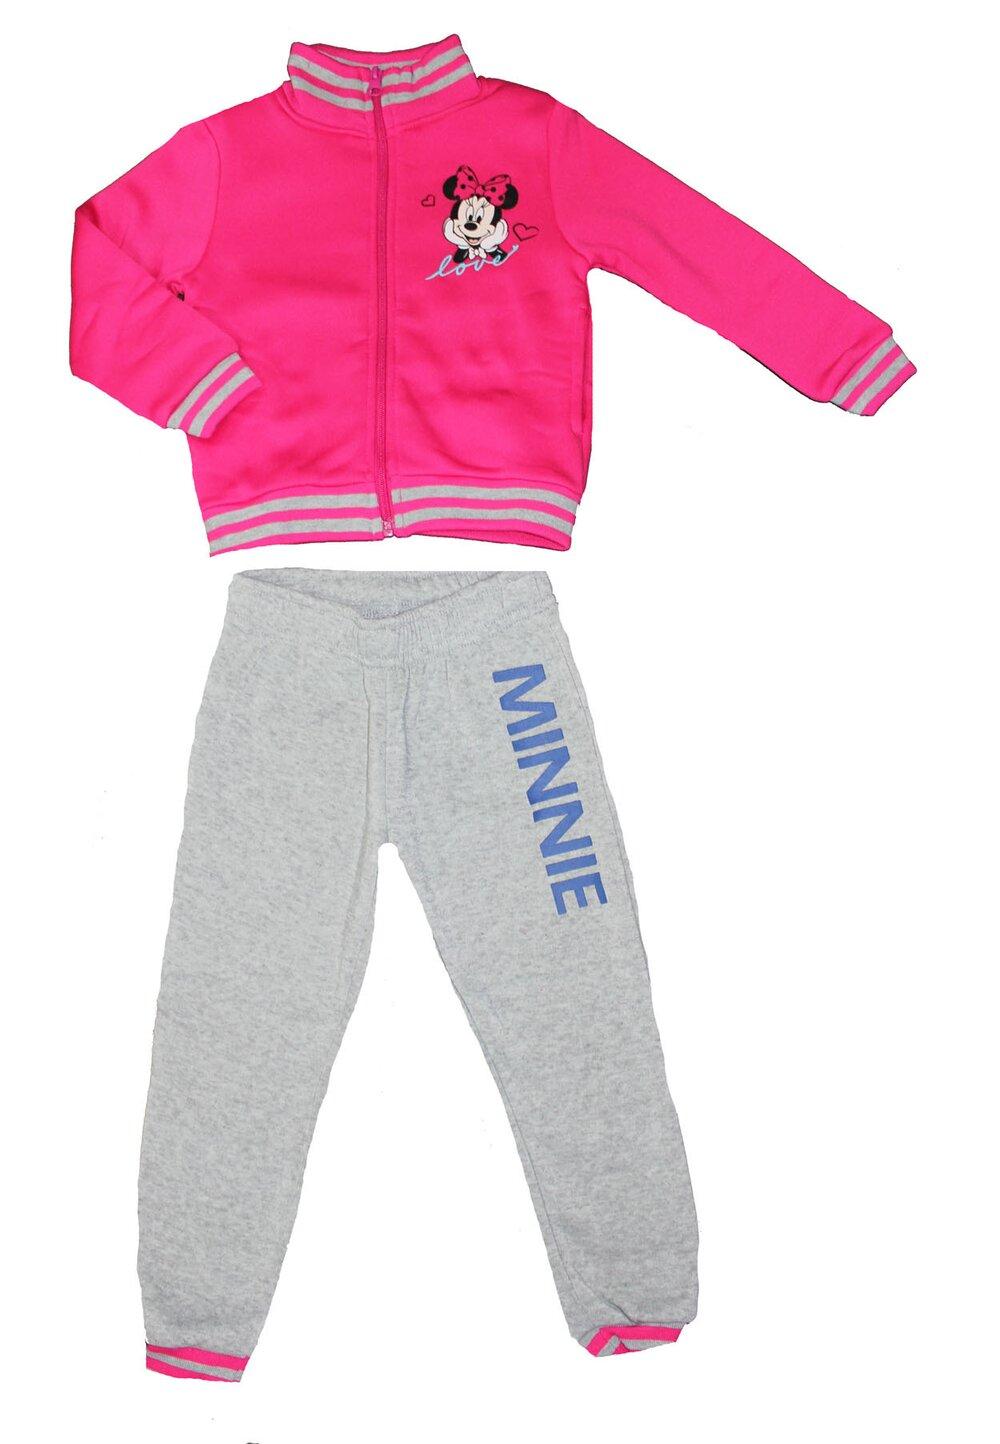 Trening, Love Minnie, roz imagine